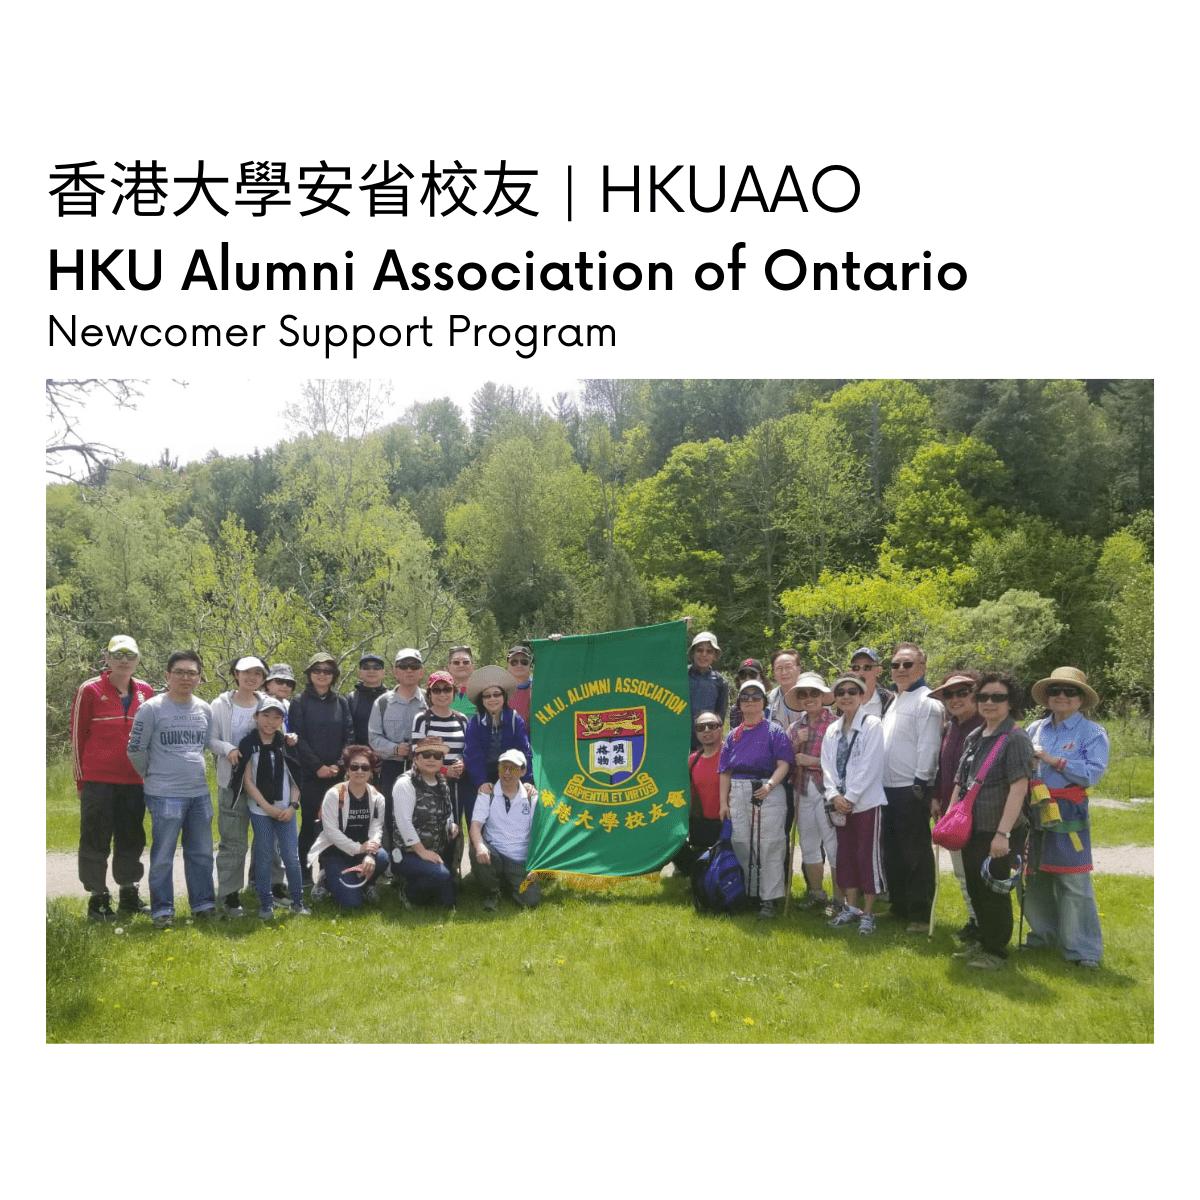 HKUAA of Ontario Newcomer Support Program